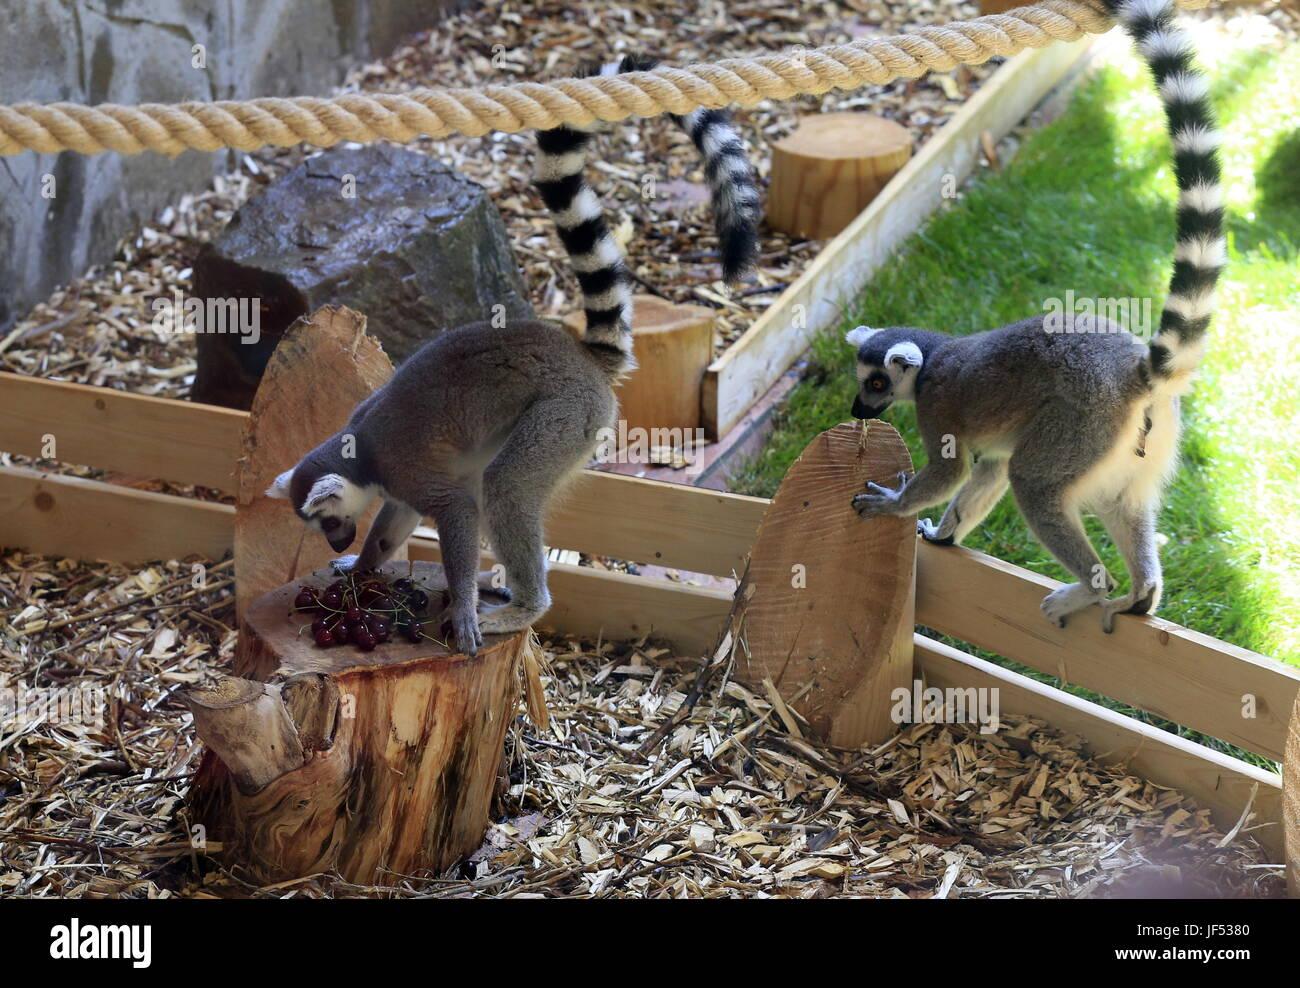 ROSTOV-ON-DON, RUSSIA – JUNE 28, 2017: Ring-tailed lemurs at the Rostov-on-Don Zoo. Valery Matytsin/TASS - Stock Image